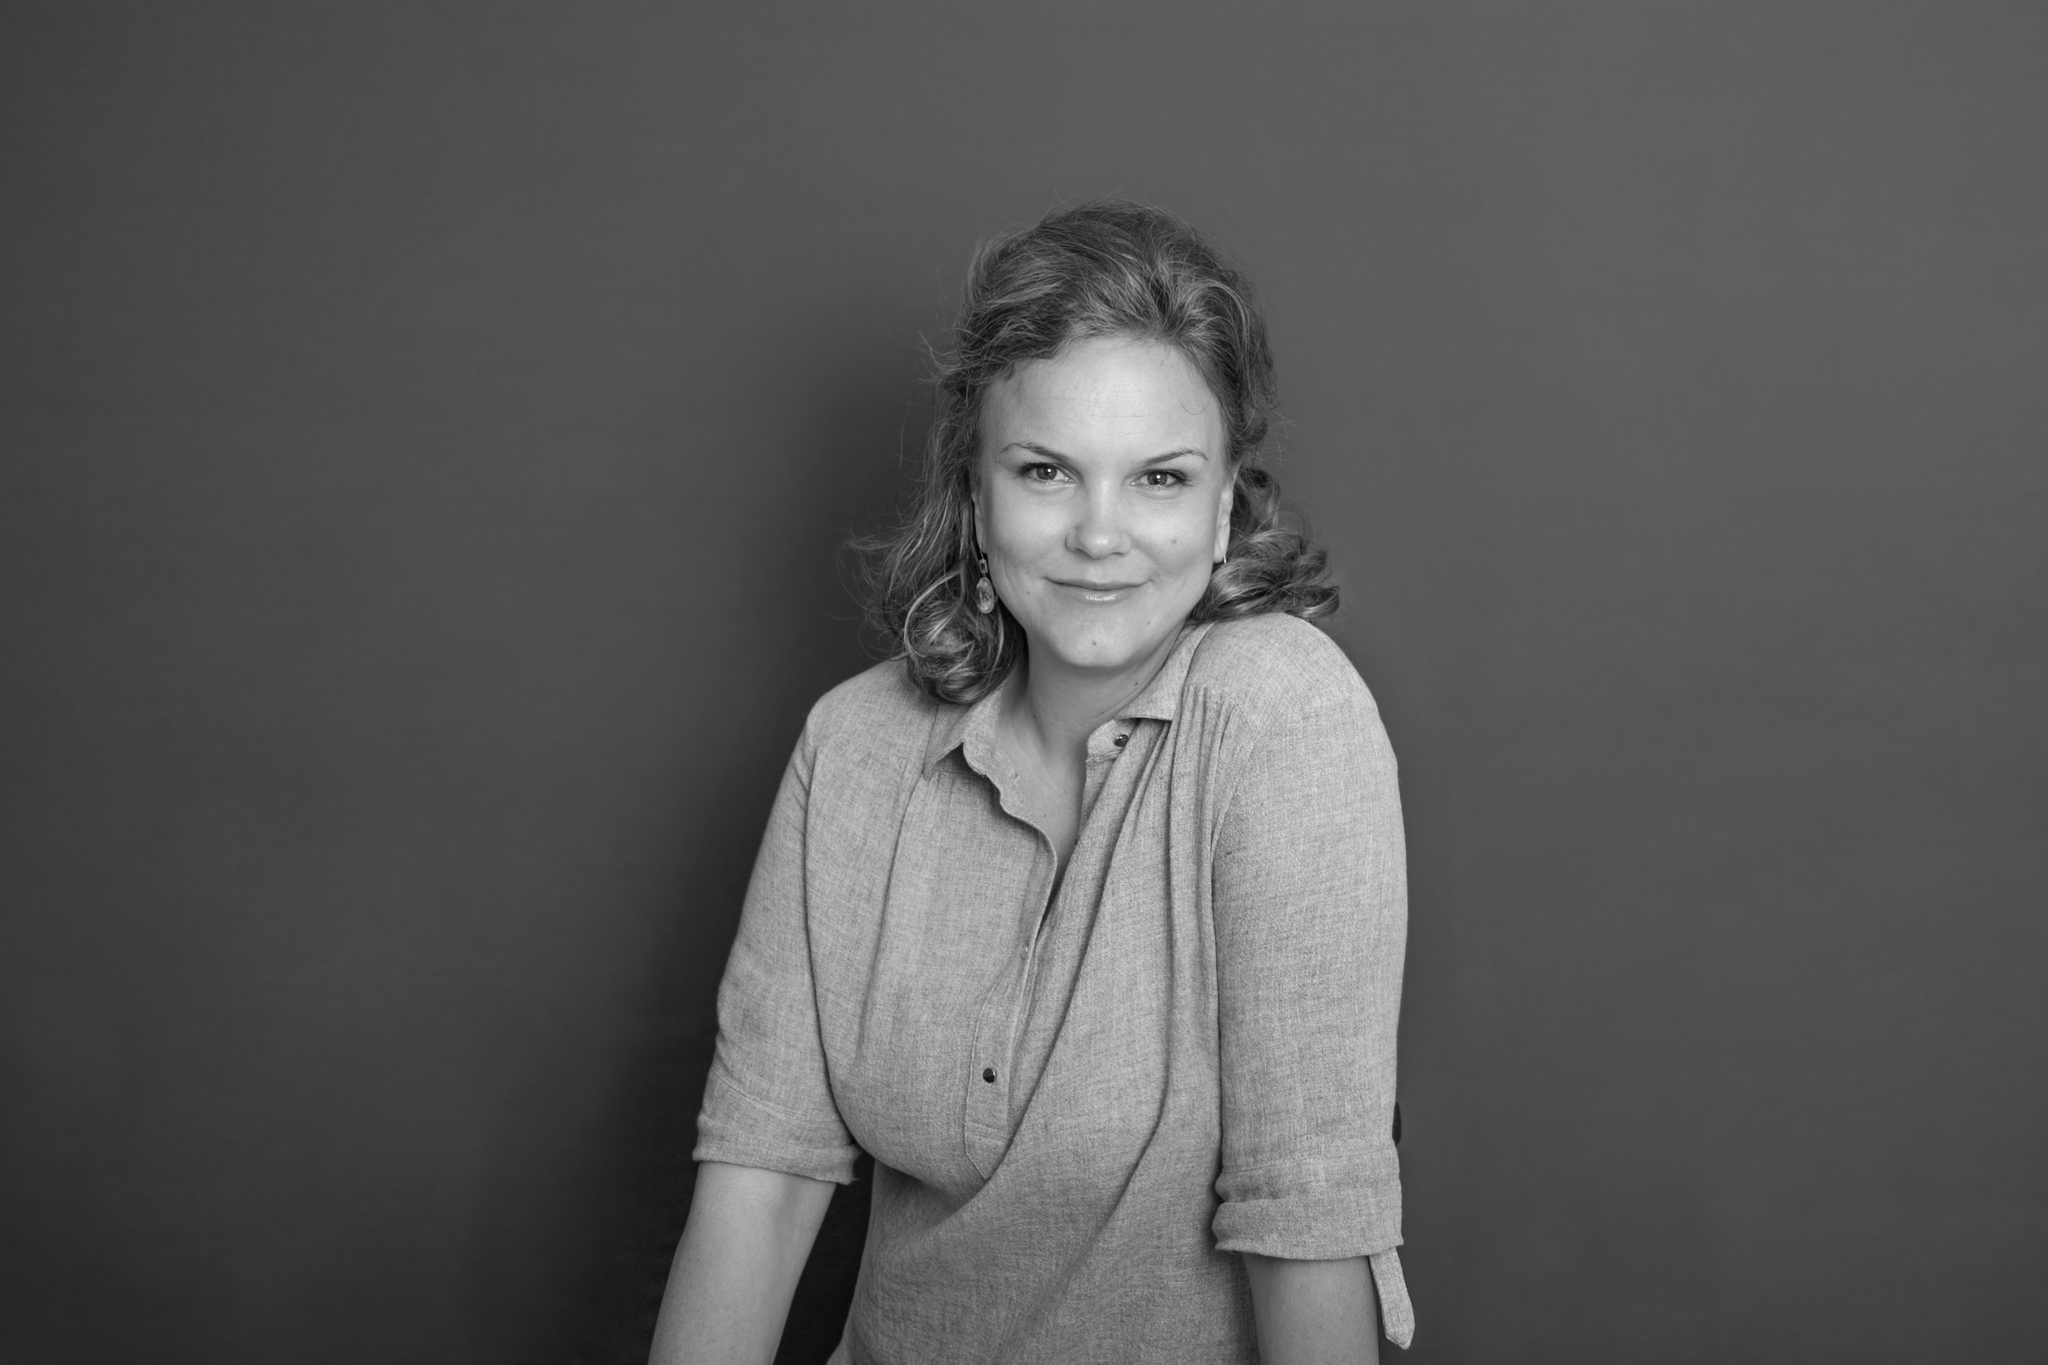 Sophie Von Schönburg, la ahijada de la reina Sofía